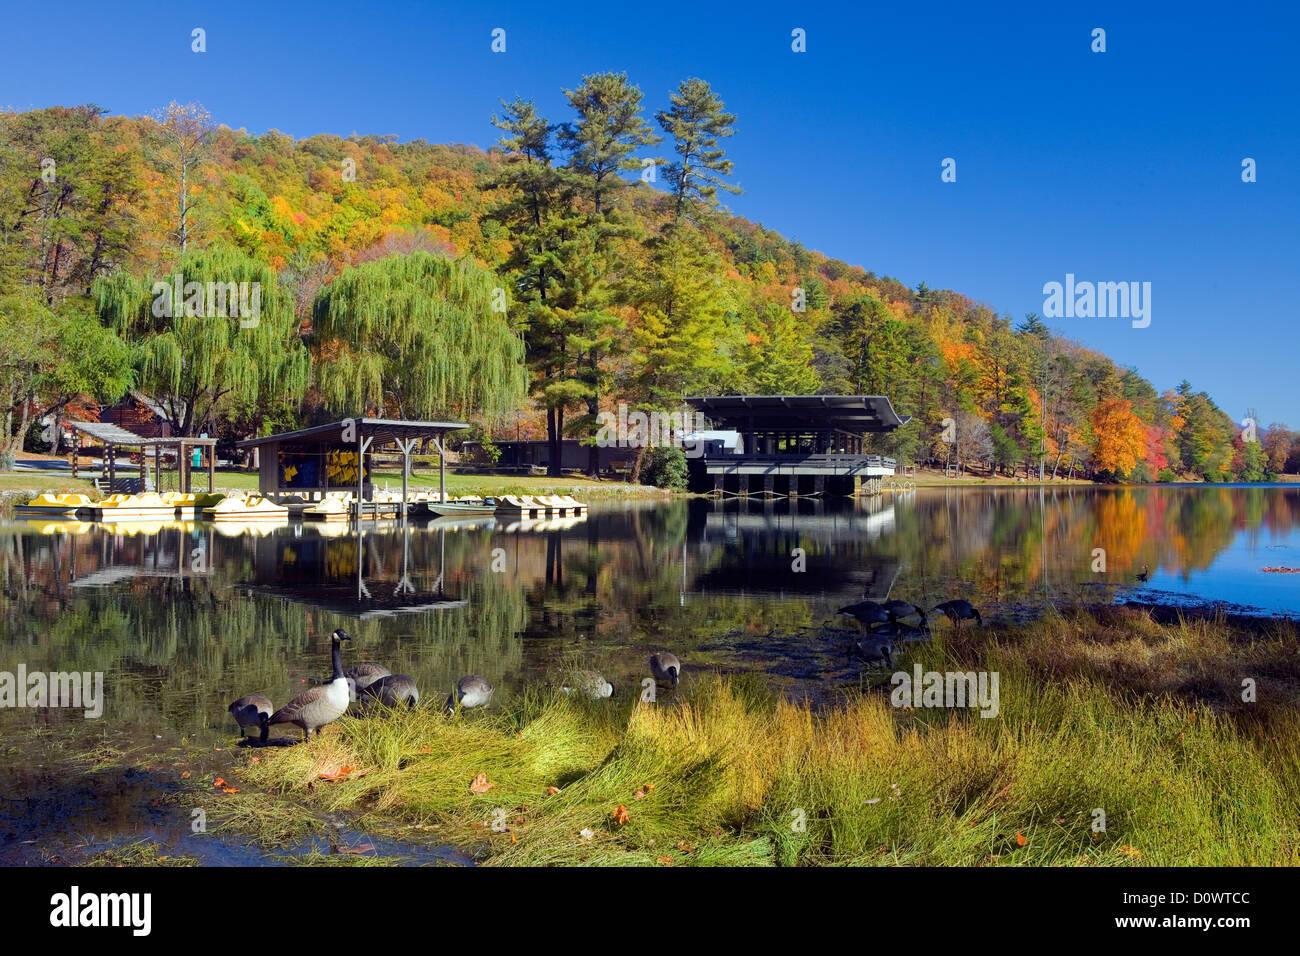 GA00199-00...GEORGIA - Trahlyta Lake in Vogel State Park. - Stock Image